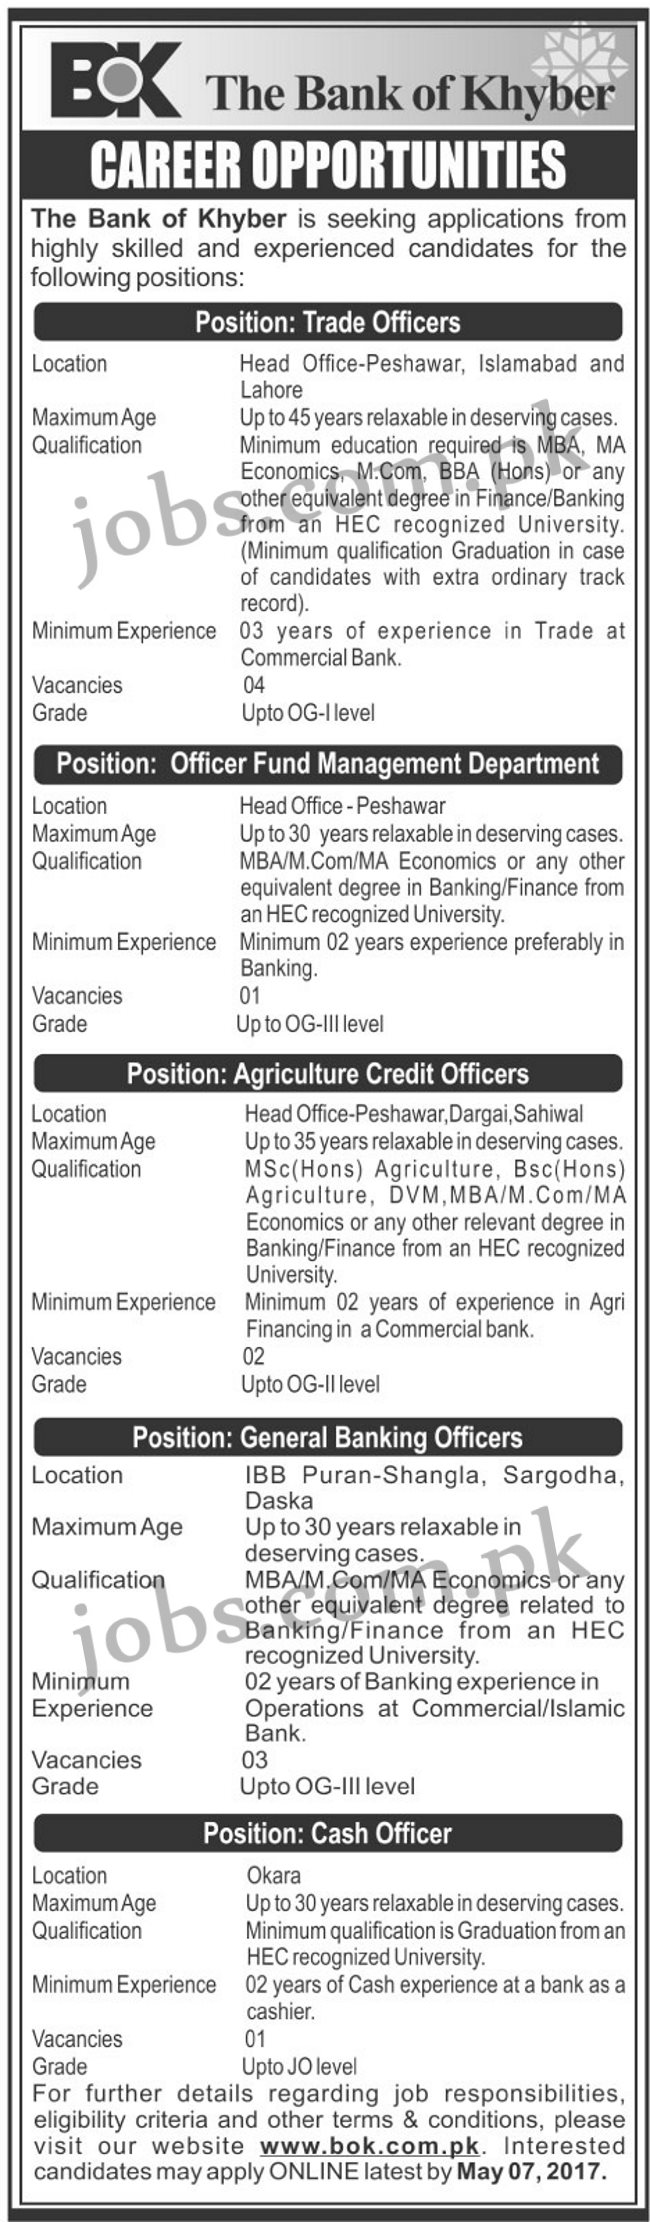 job qualification